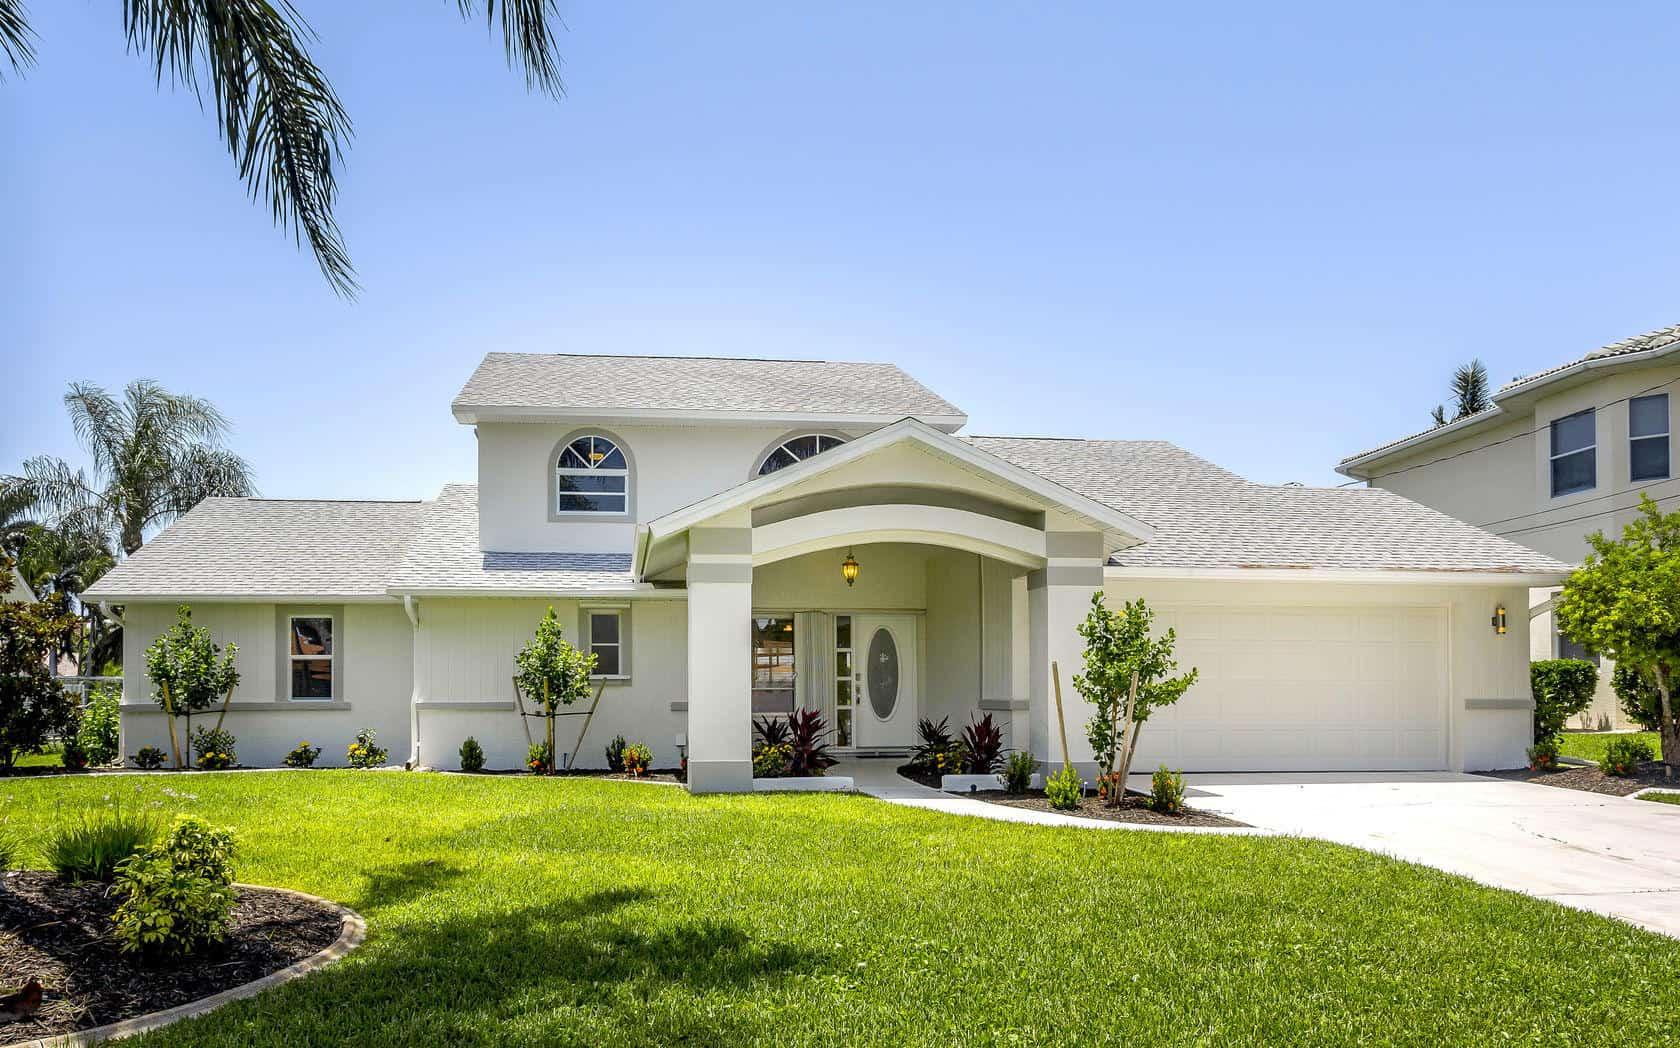 Villa Graceland in Cape Coral | SunshineState Network